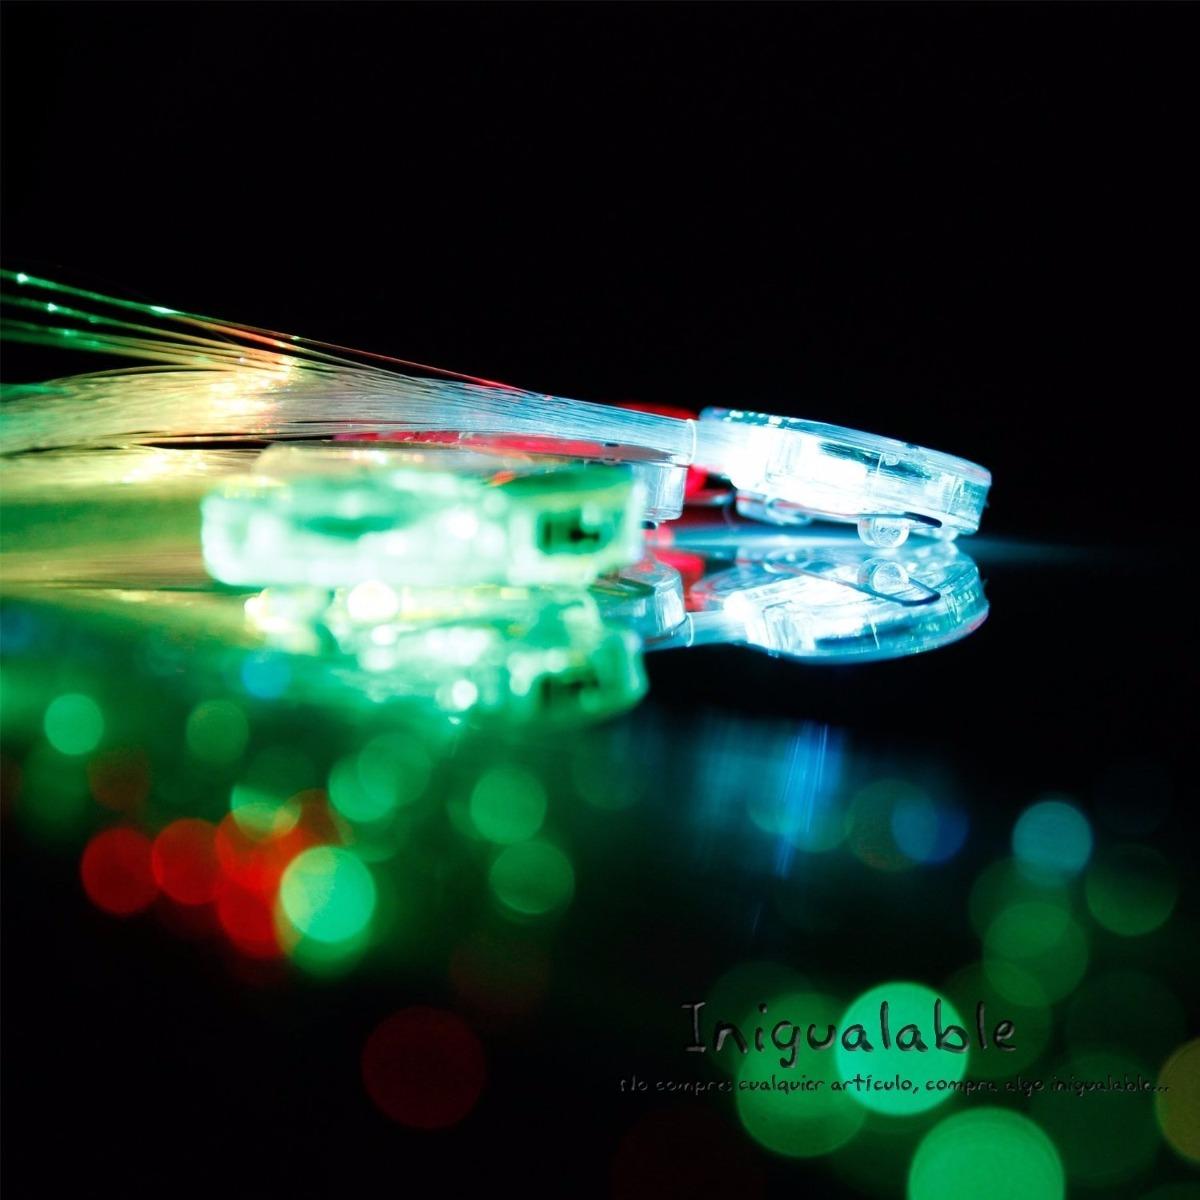 Extenciones para el pelo de colores con luces led 600 - Luces led de colores ...